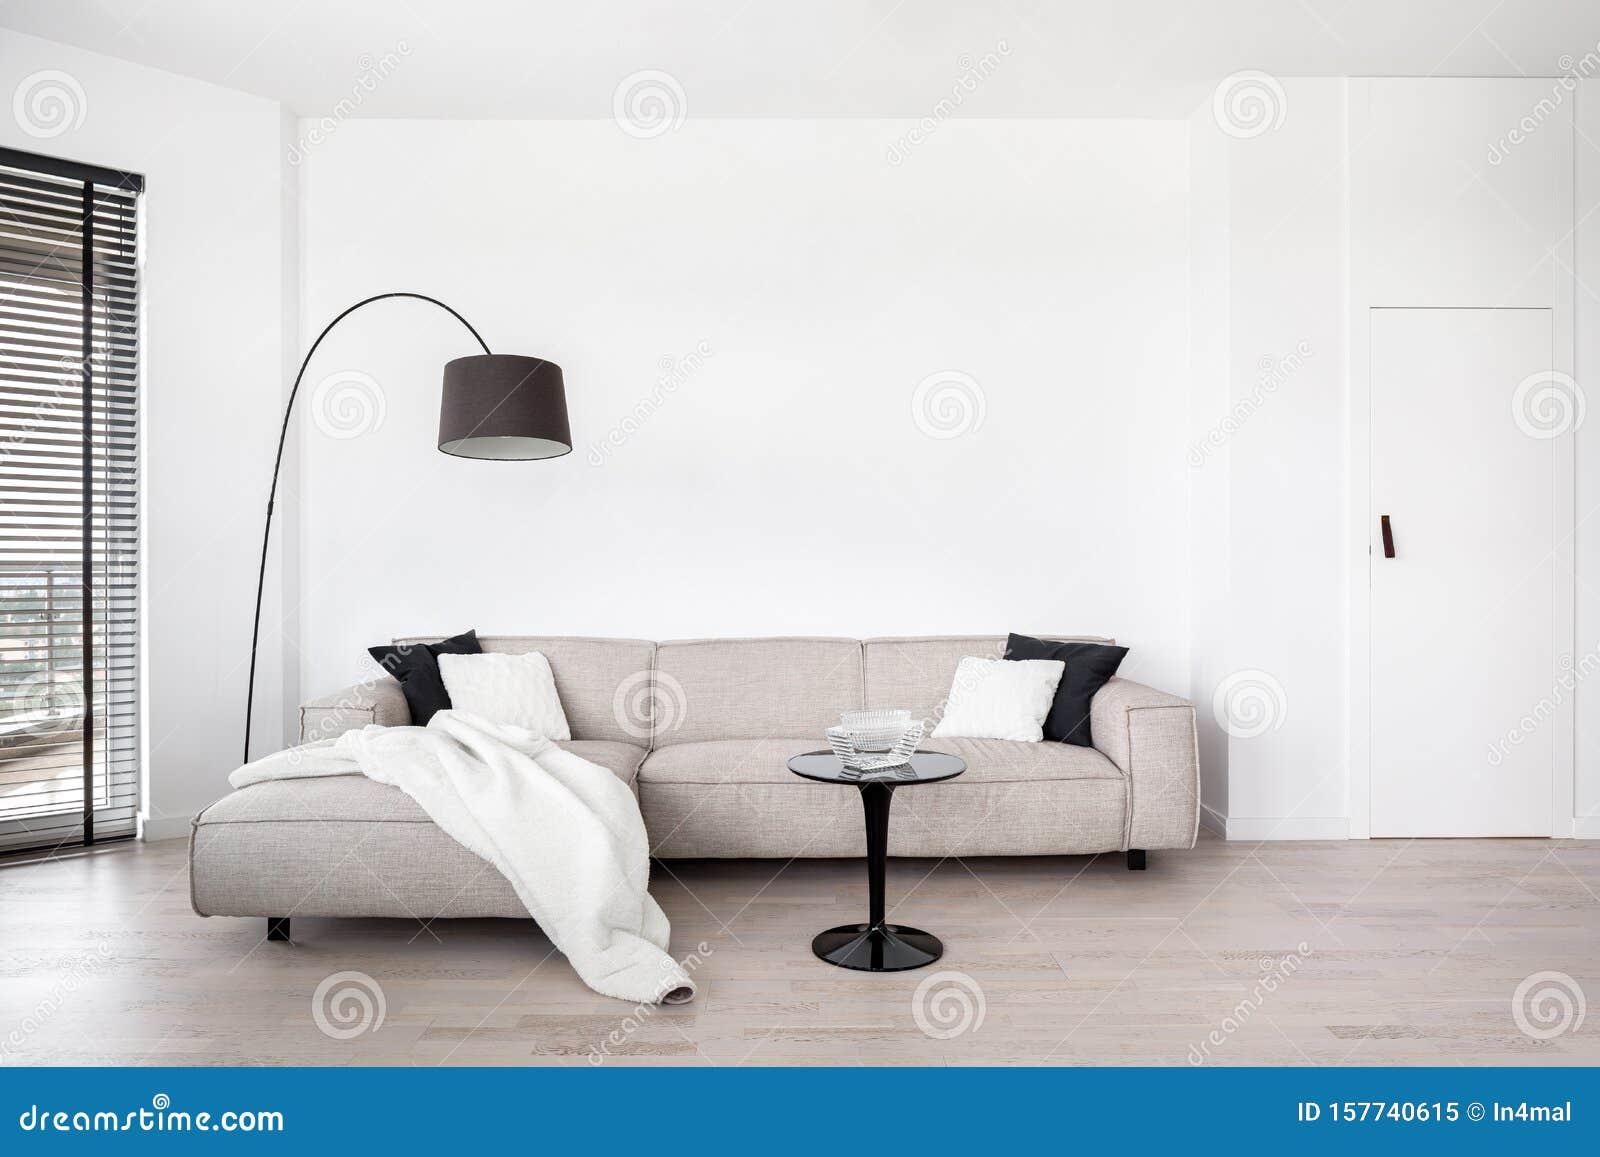 Corner Sofa With Coffee Table Stock Image - Image of corner ...